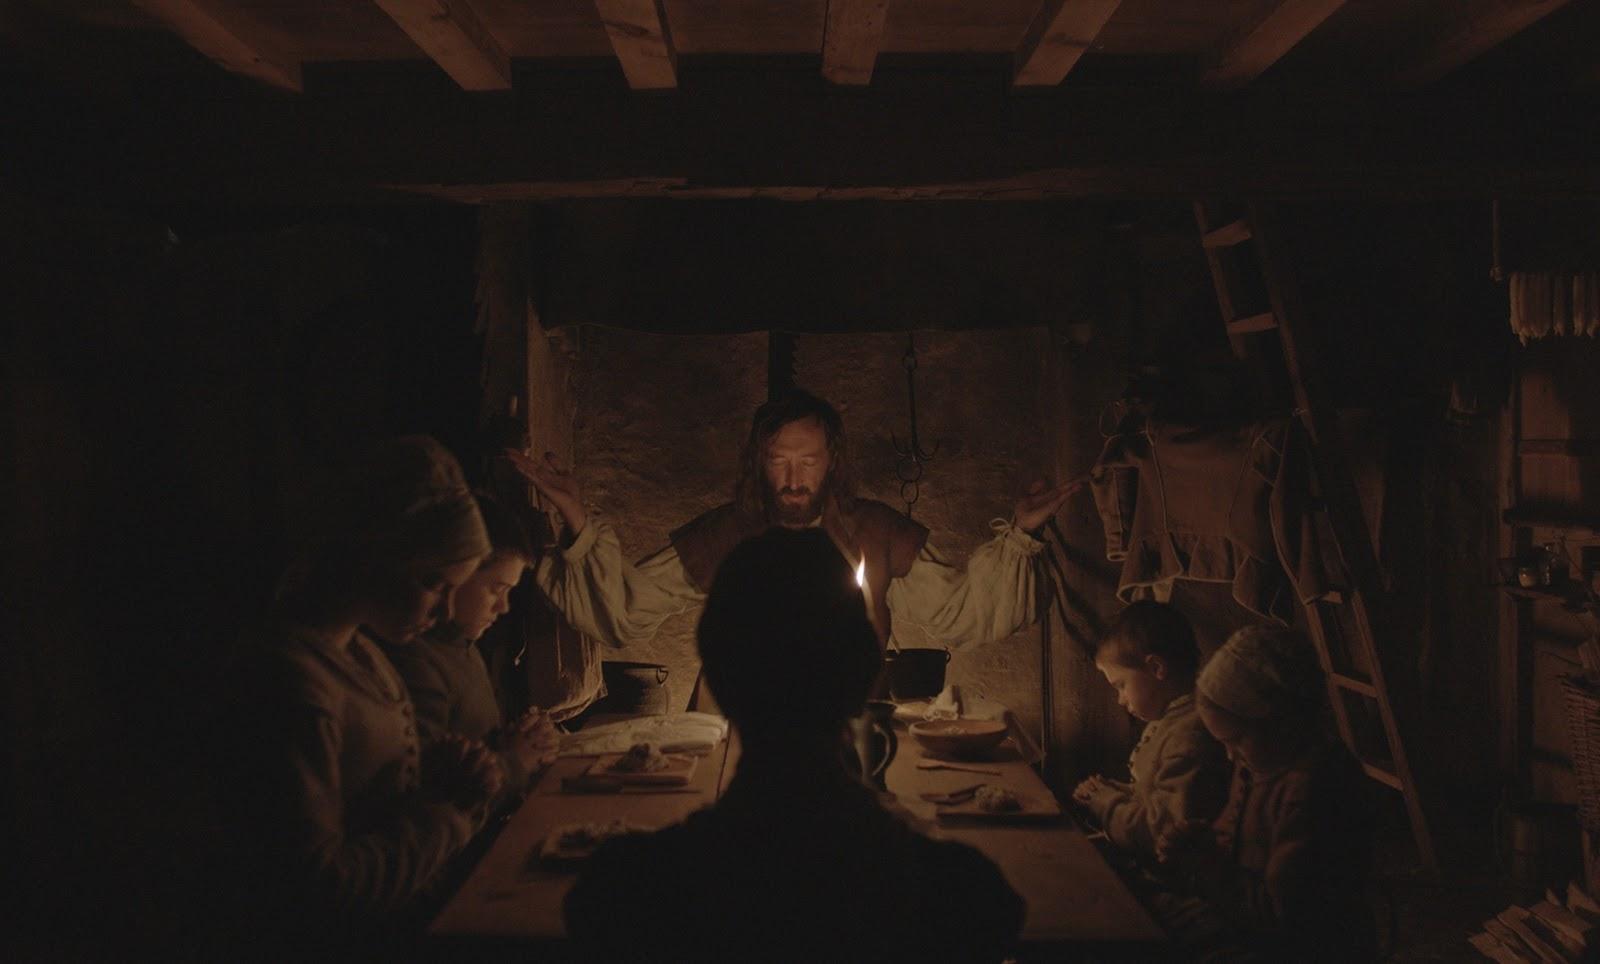 vvitch a new england folktale 2015